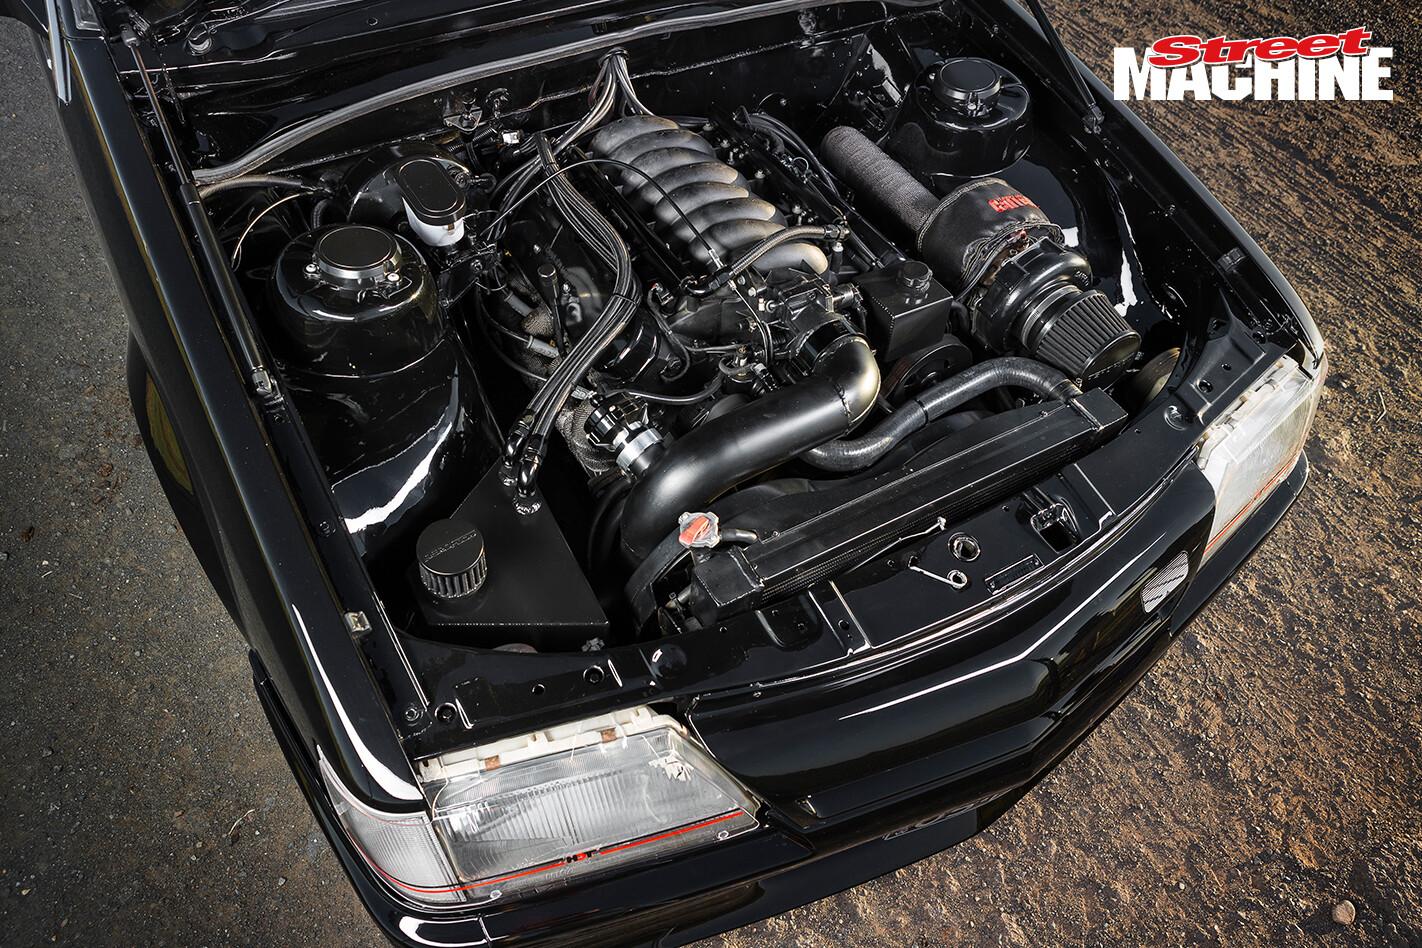 VK Commodore Brocky LS 1 Turbo Engine 1 Nw Jpg